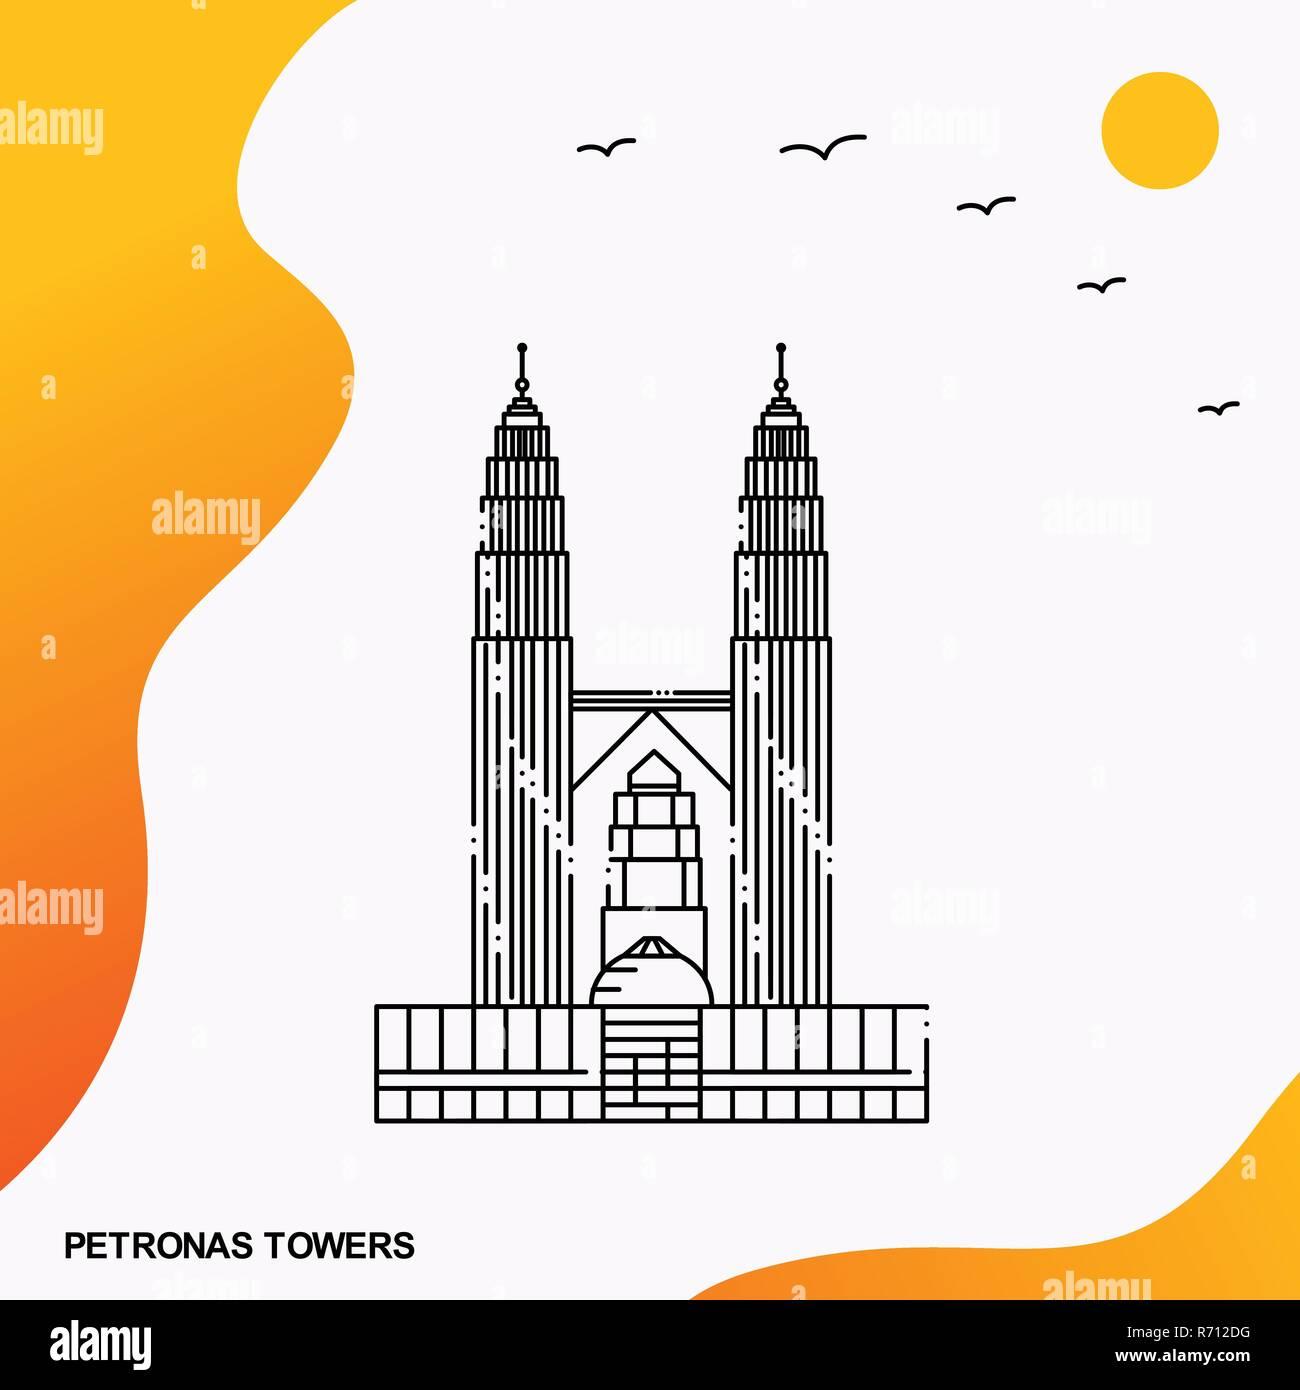 Travel PETRONAS TOWERS Poster Template - Stock Vector